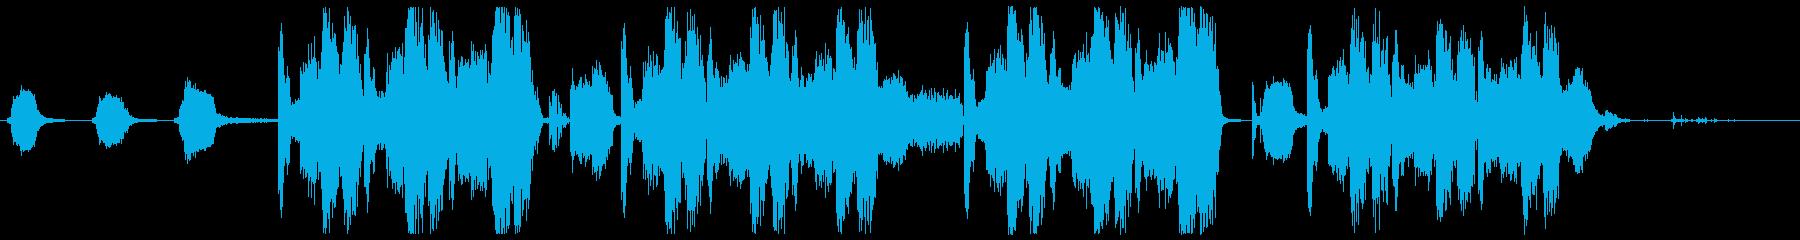 CM-(Future/Pop)の再生済みの波形